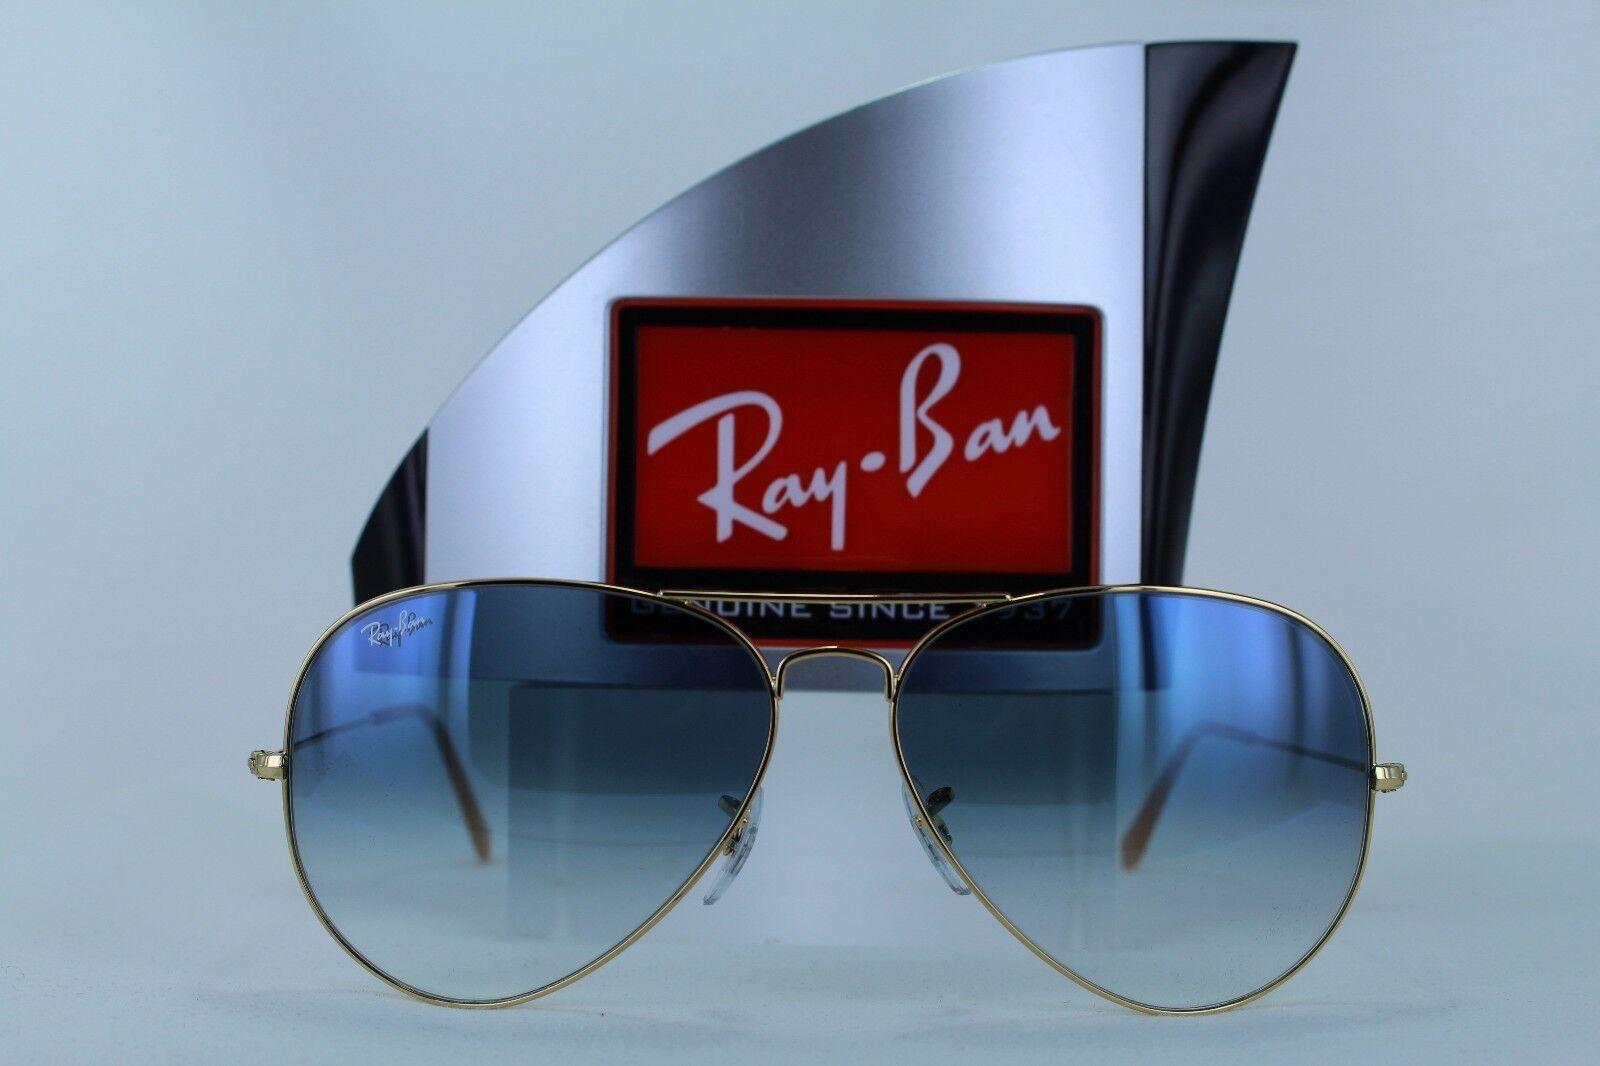 db9ba14da5a Ray Ban RB3025 Classic Aviator 001 3F Blue Gradient Lens 62mm Gold  Sunglasses for sale online